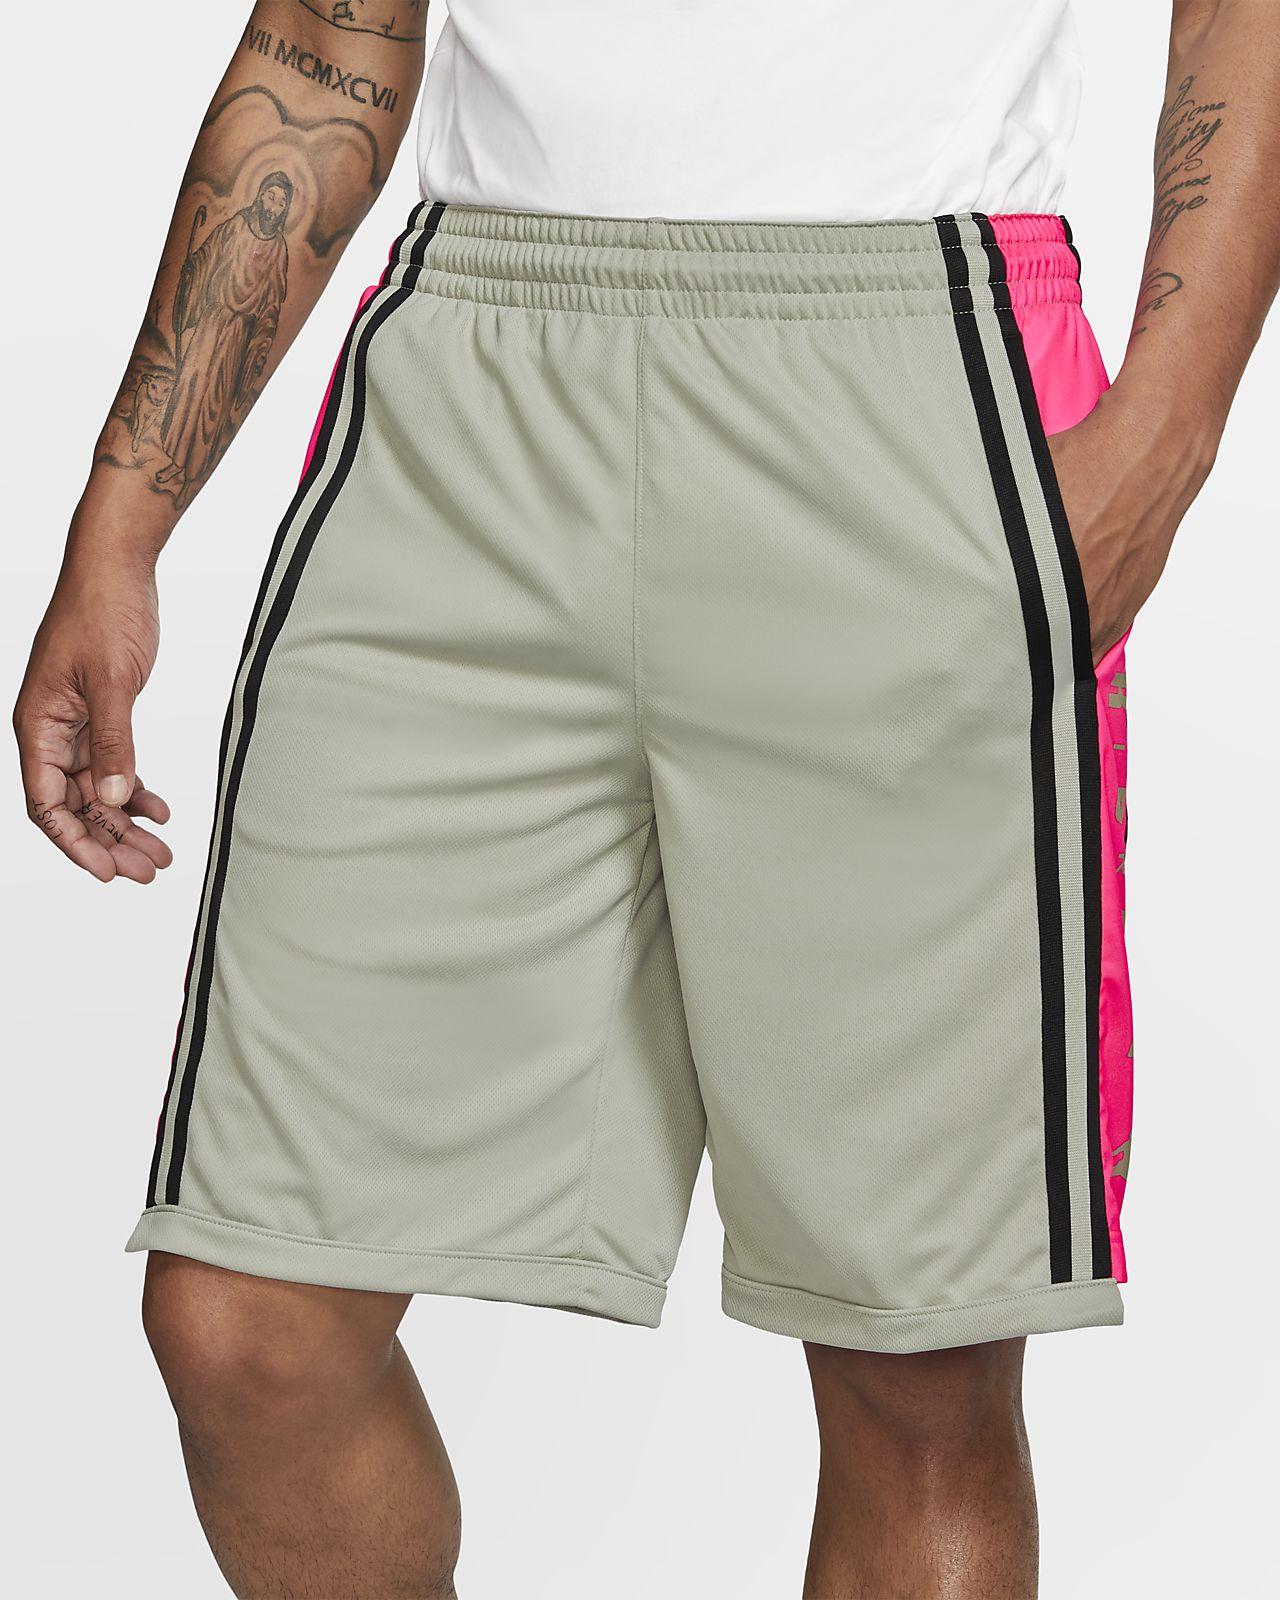 Shorts de básquetbol para hombre Jordan HBR